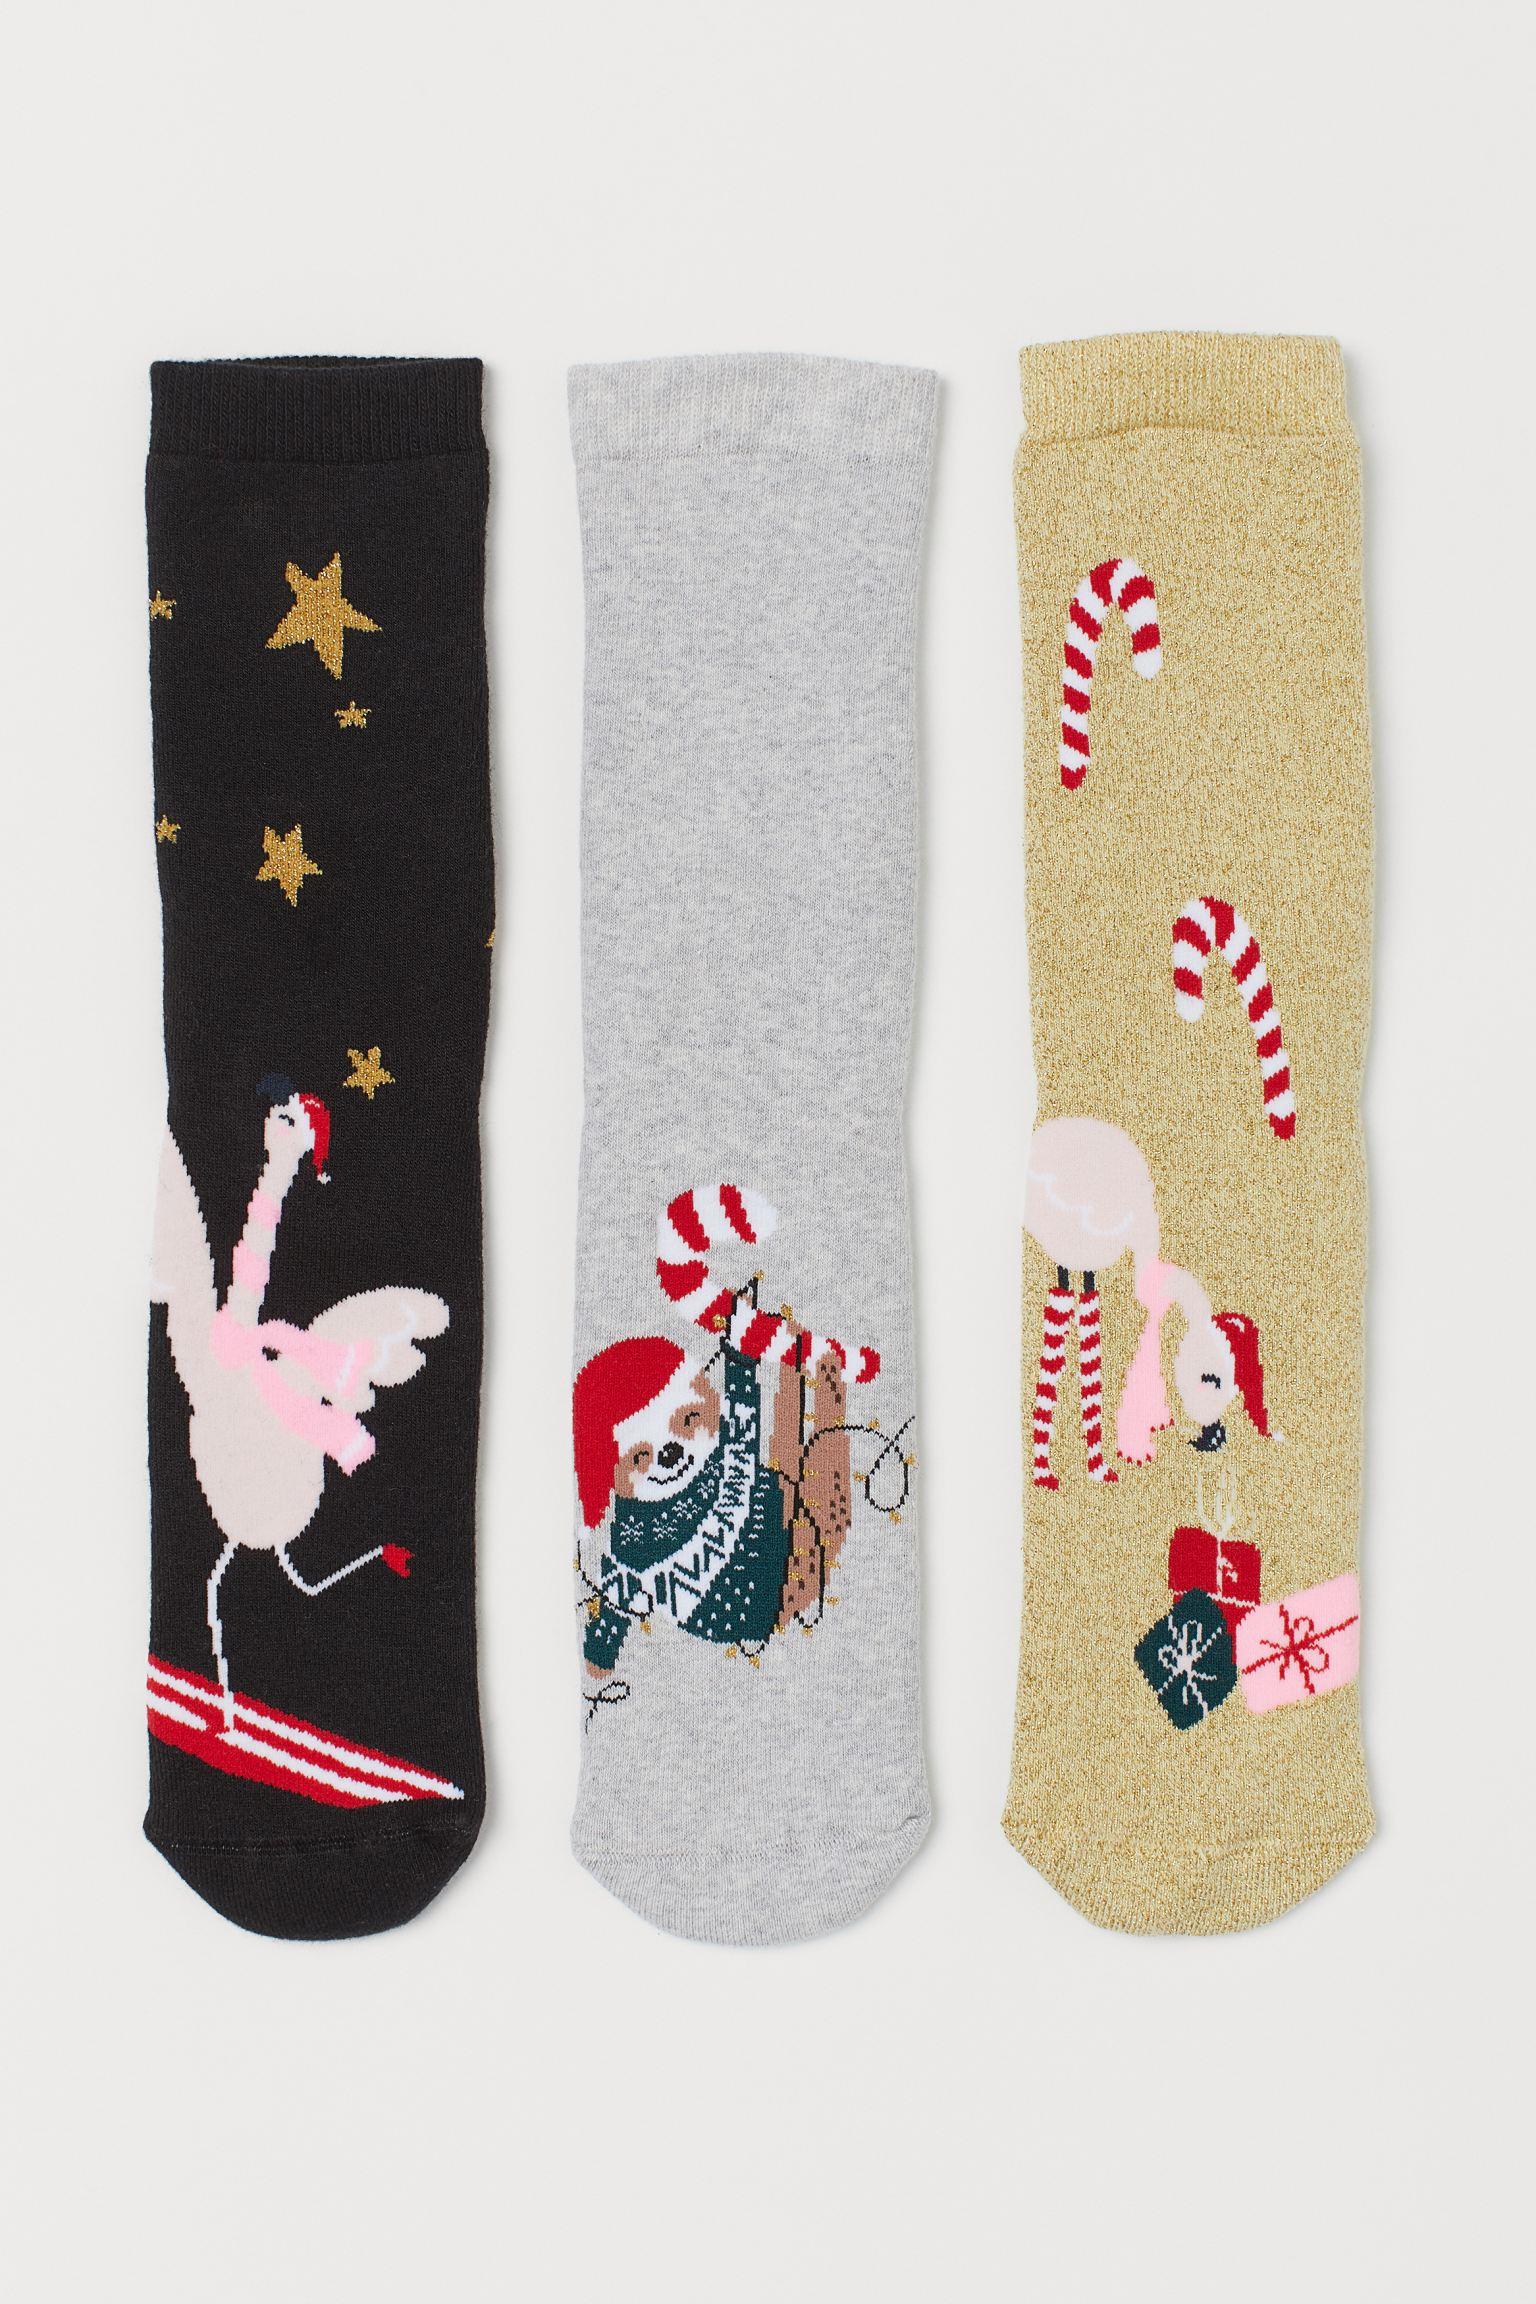 Pack de tres calcetines navideños